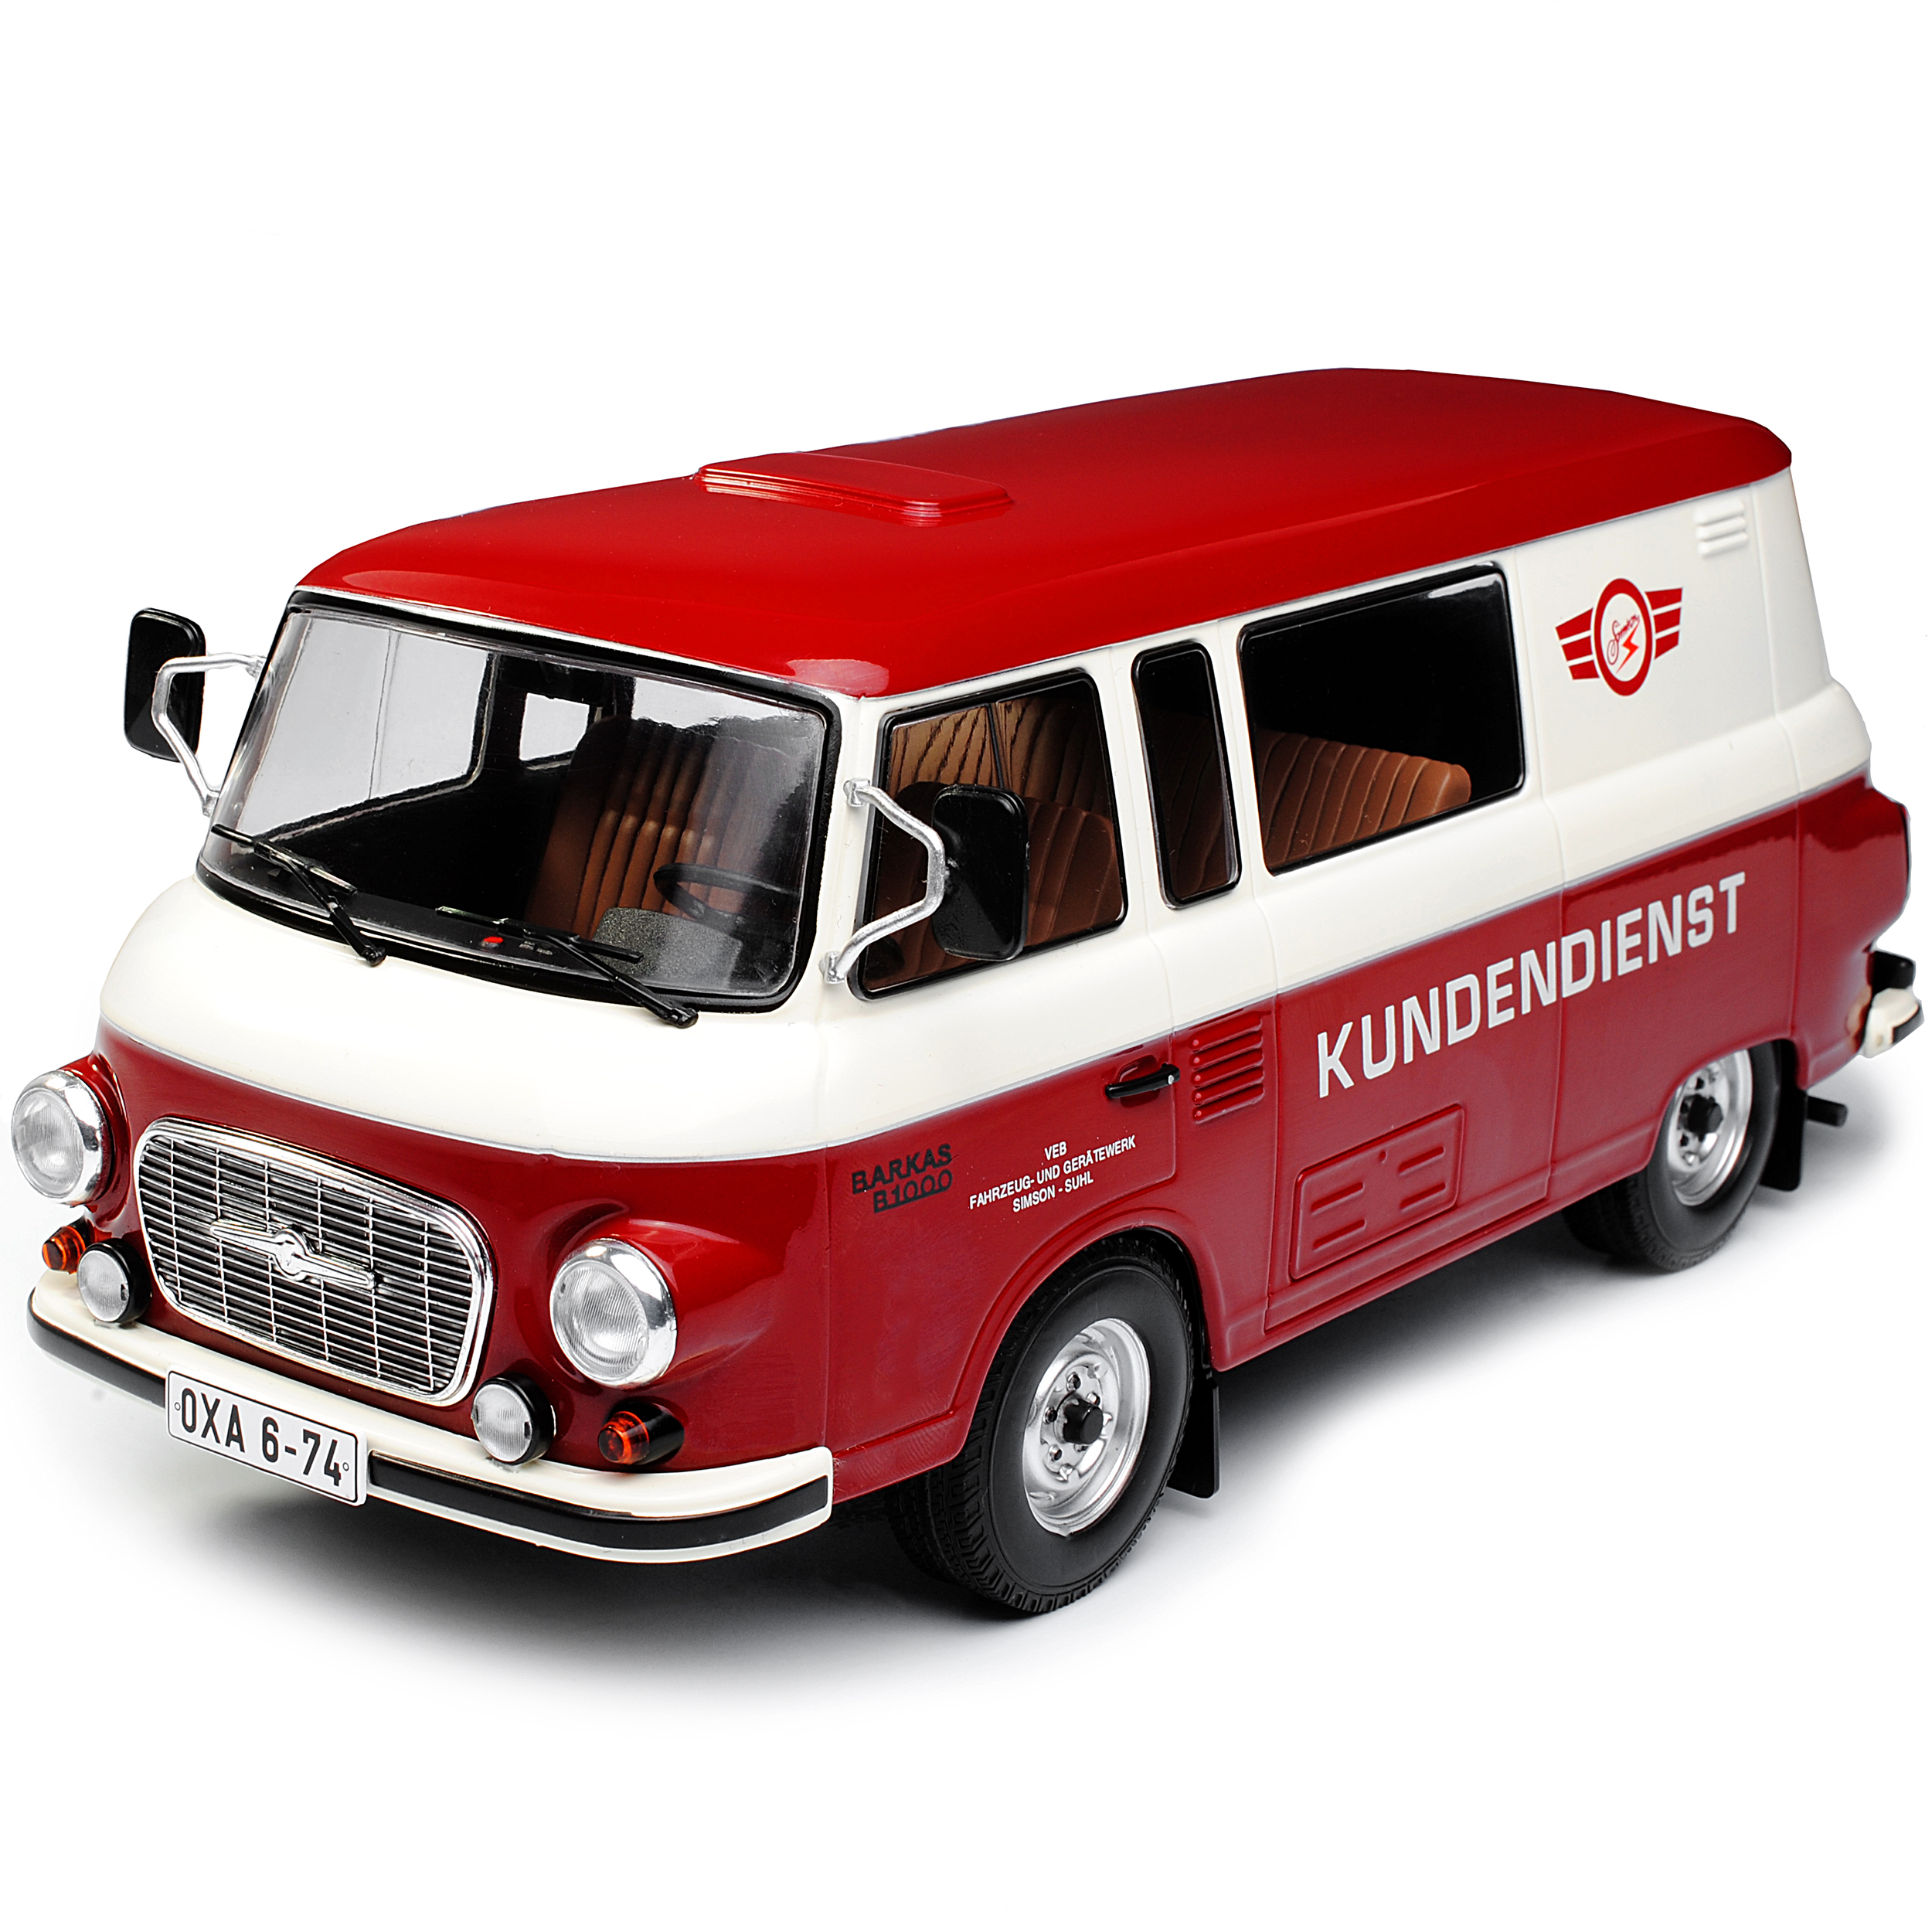 Barkas B1000 Bus Halbbus Simson Kundendienst VEB DDR Rot Beige 1961-1990 1//18 ..